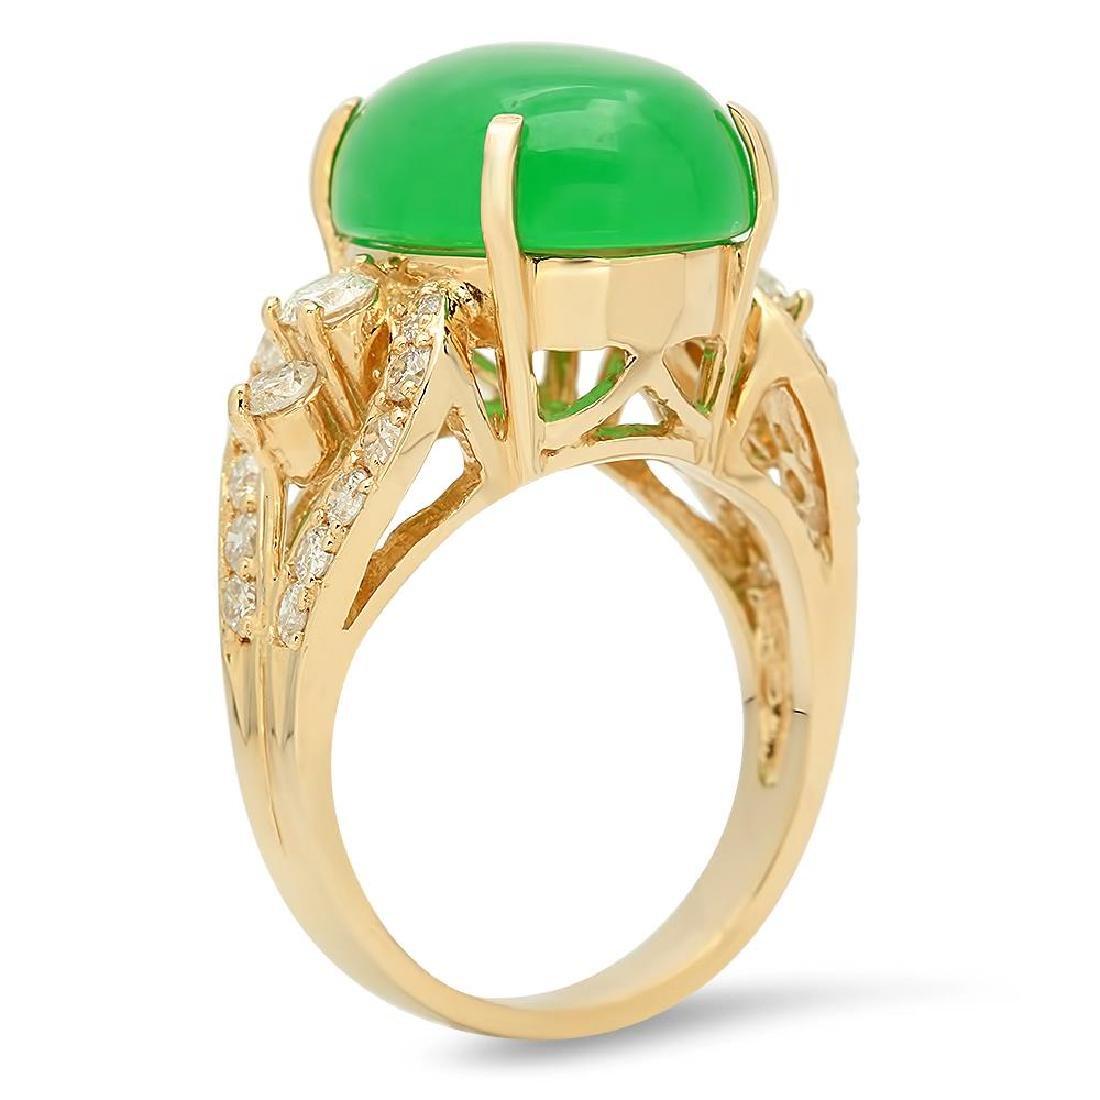 14K Gold 9.38ct Jadeite 1.25cts Diamond Ring - 2